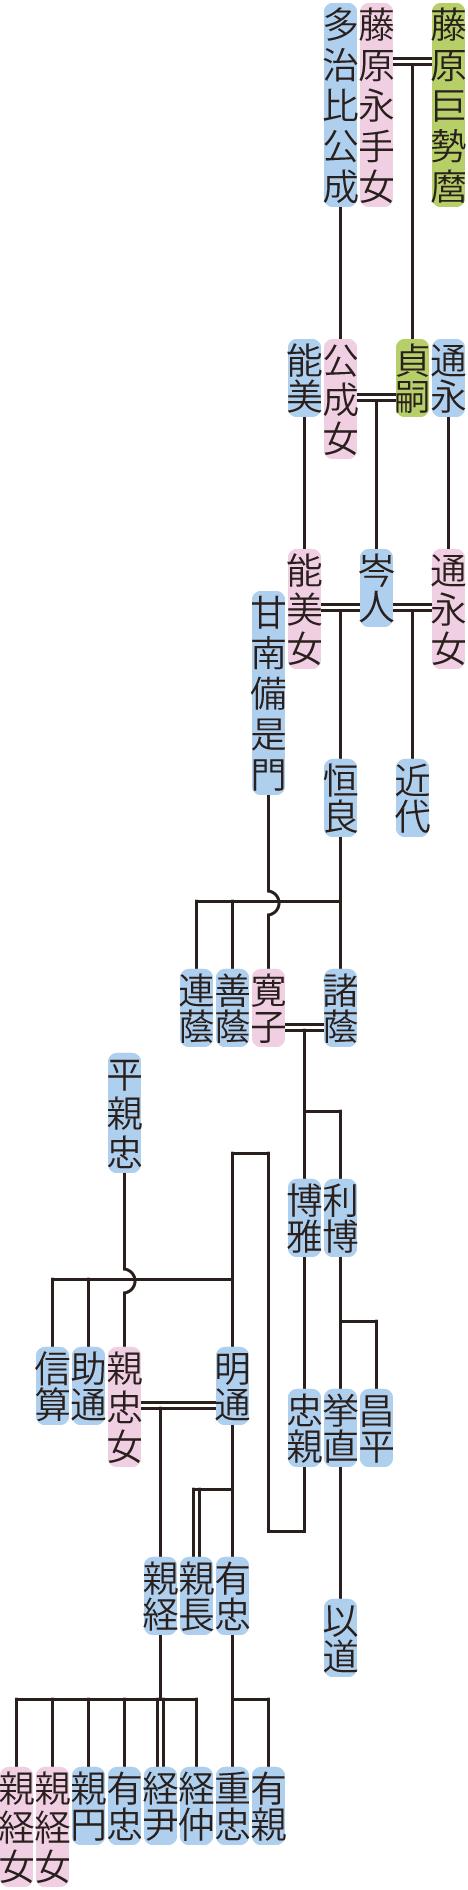 藤原岑人~明通の系図